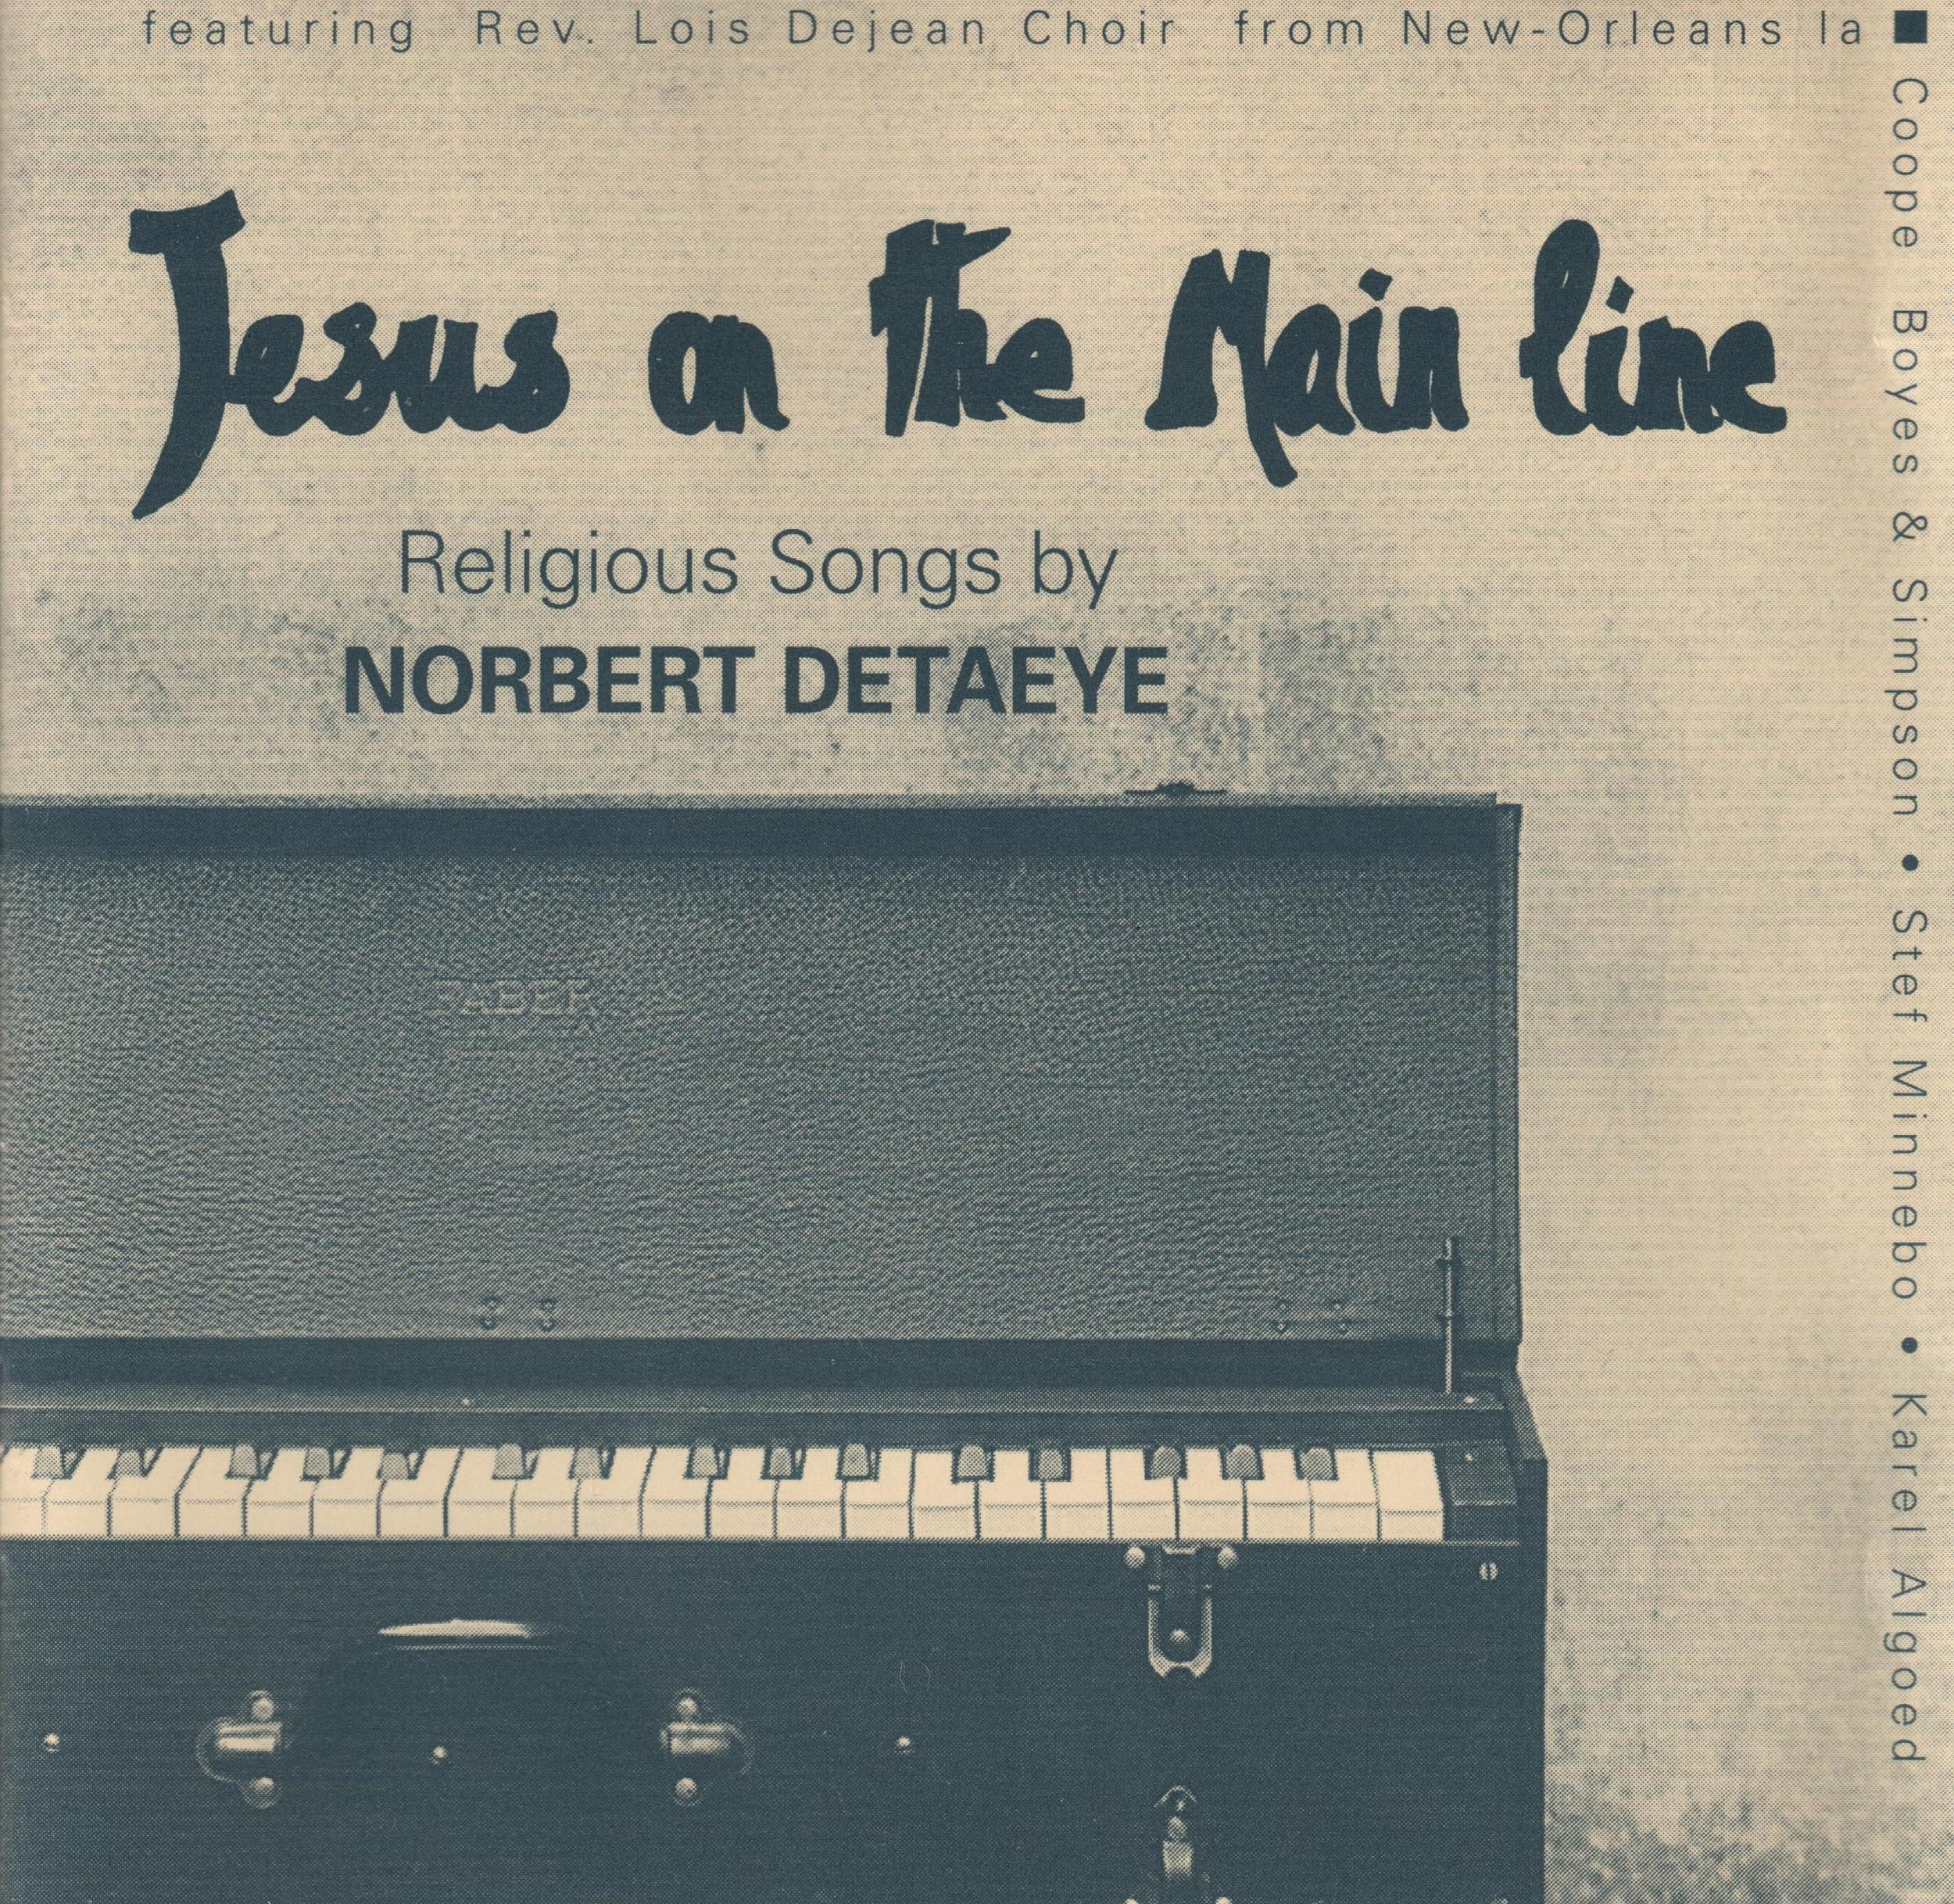 Norbert Detaeye's gospel cd. I'm the guitar player.